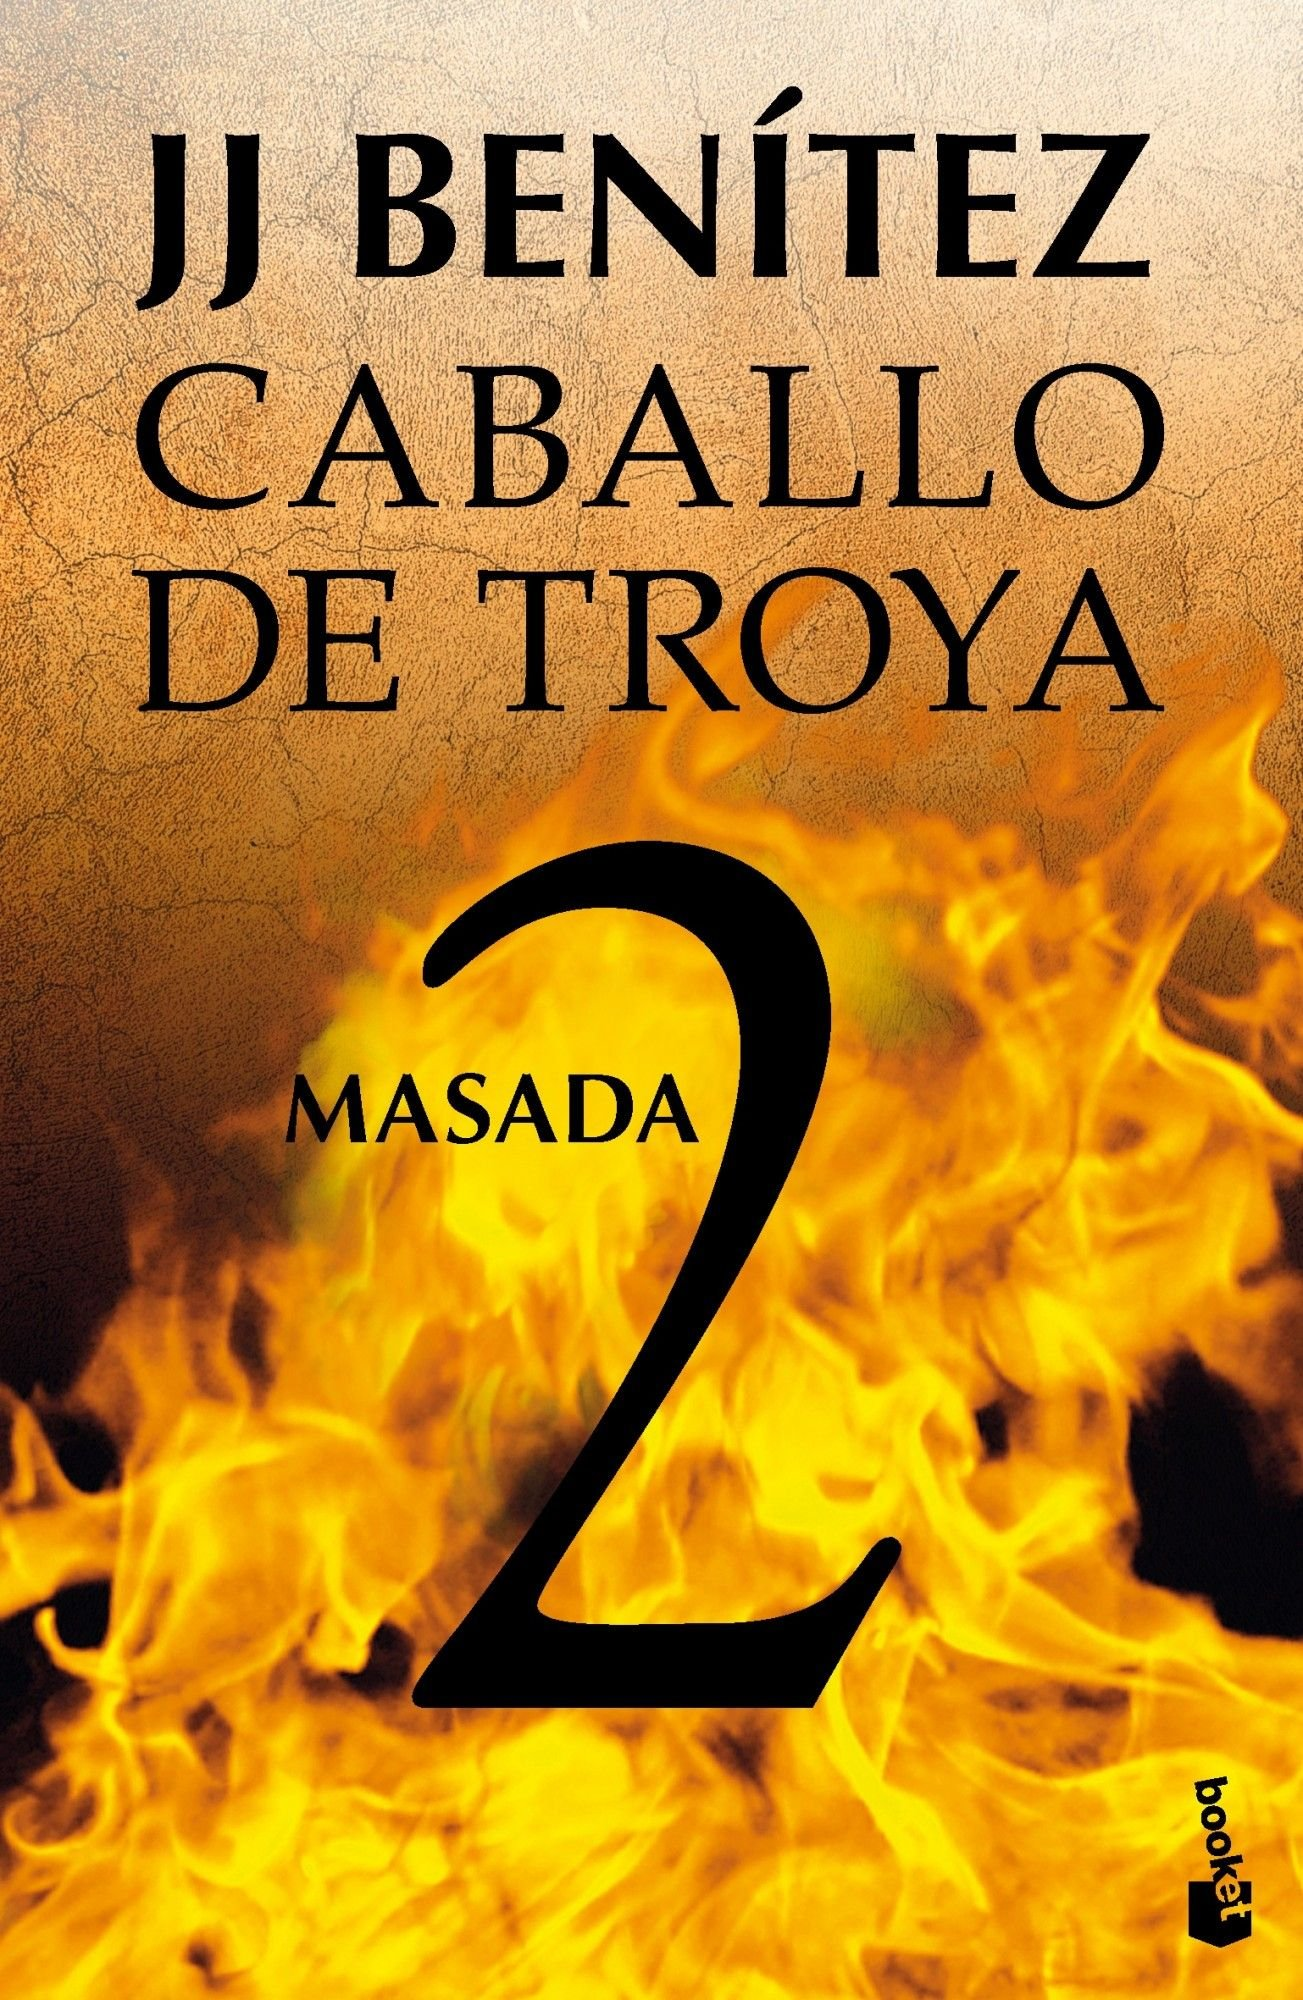 Masada. Caballo de Troya 2 (Gran Formato) Tapa blanda – 5 mar 2013 J. J. Benítez Booket 8408064045 Adventure